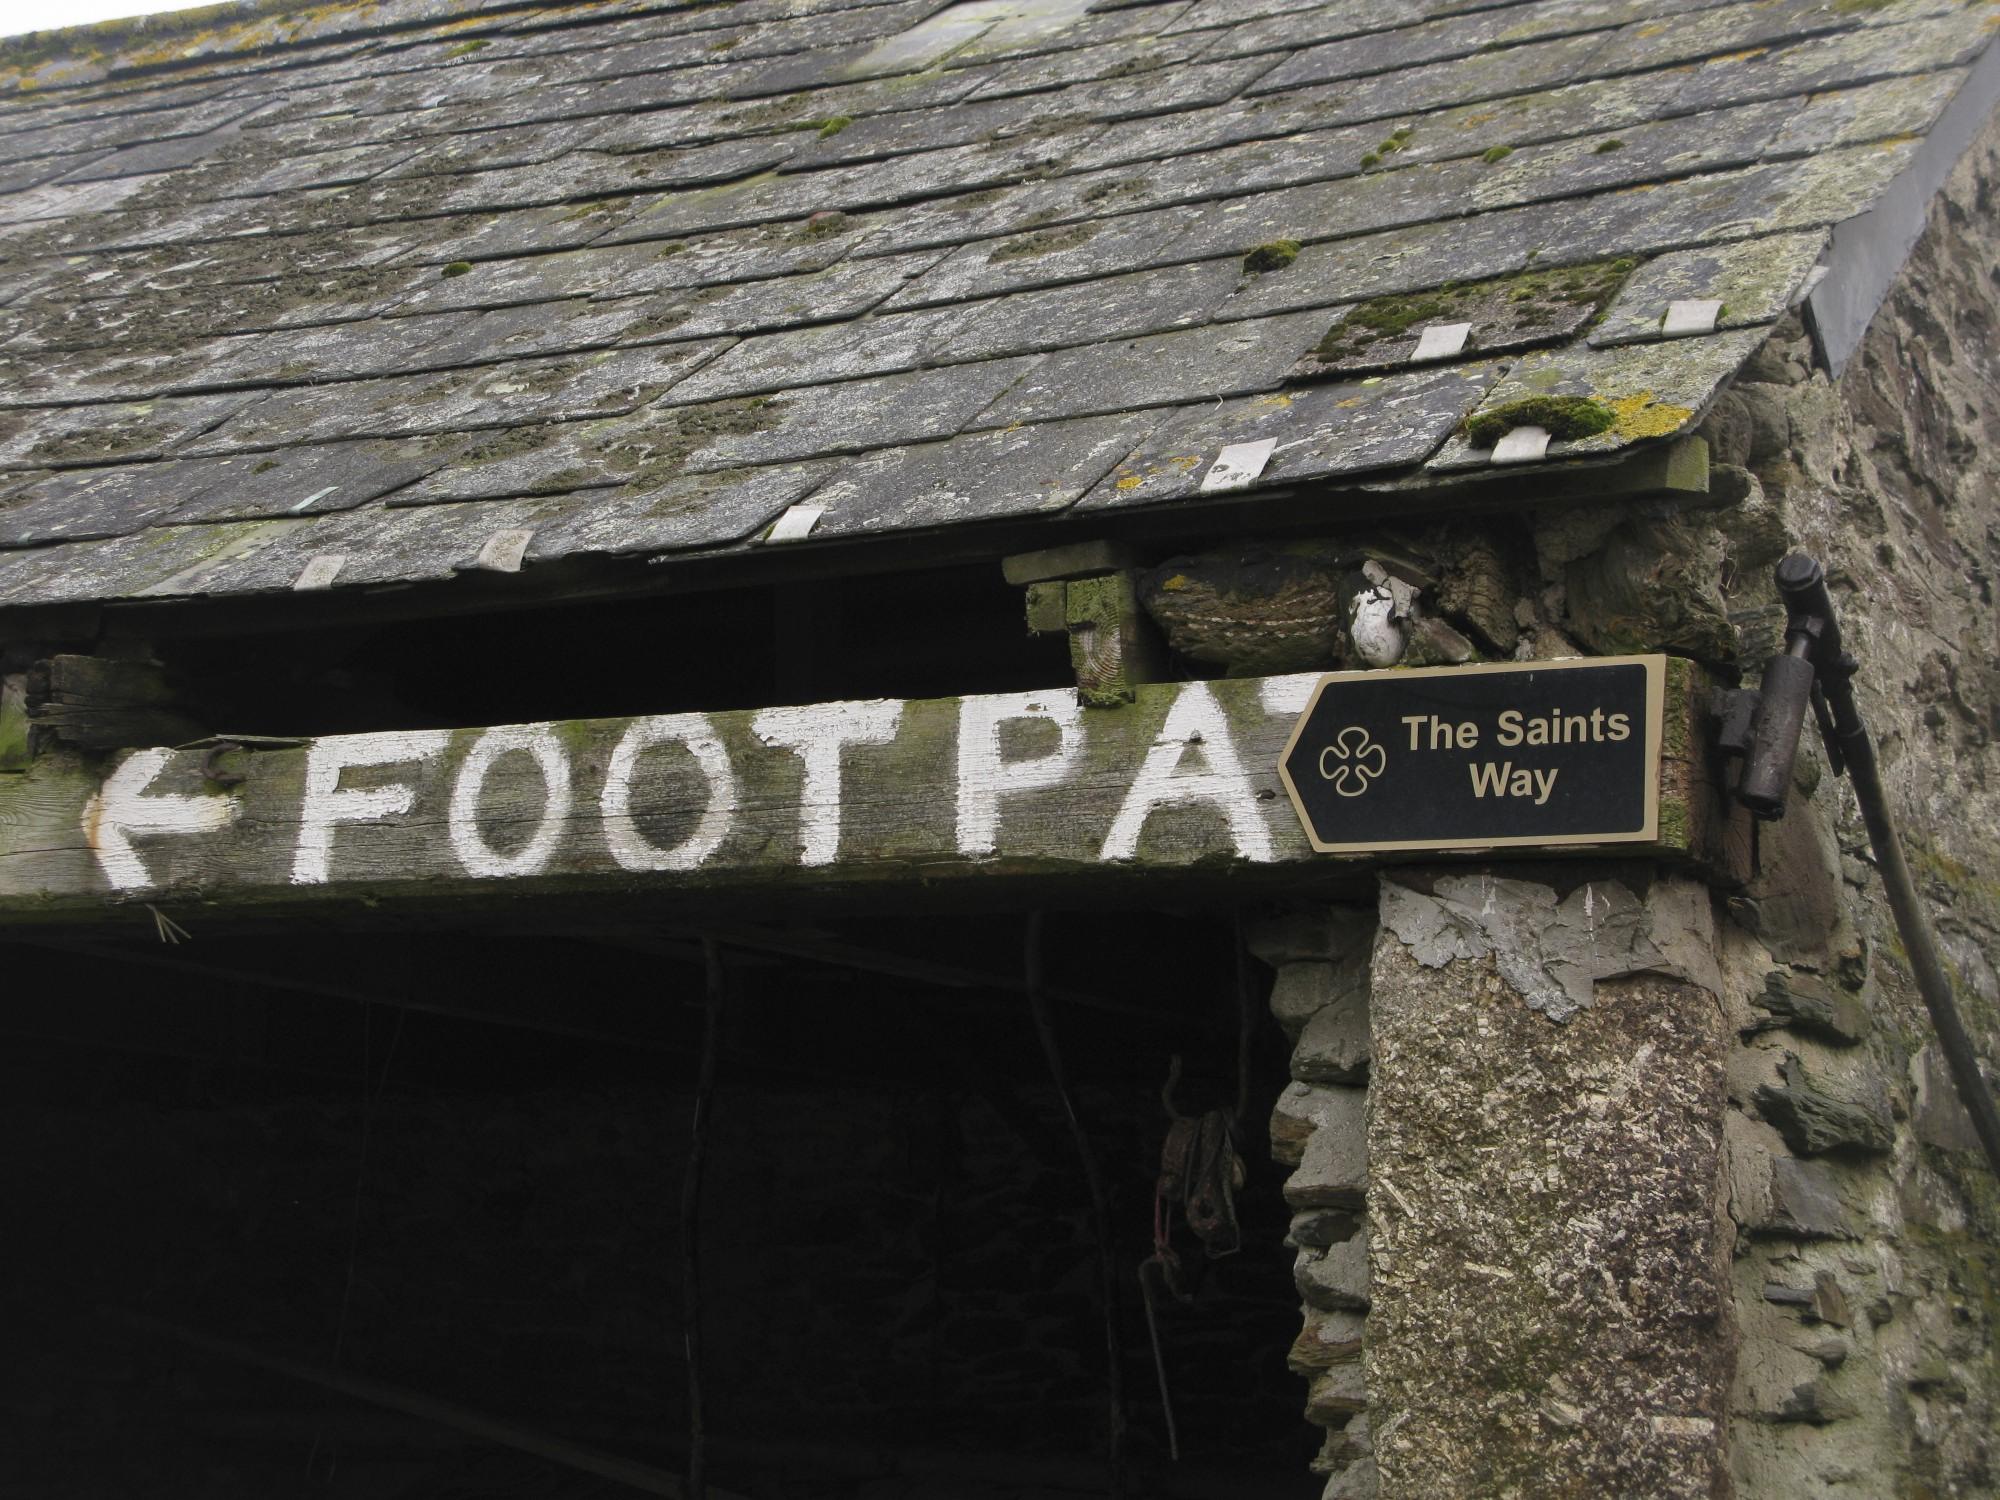 The Saint's Way Footpath